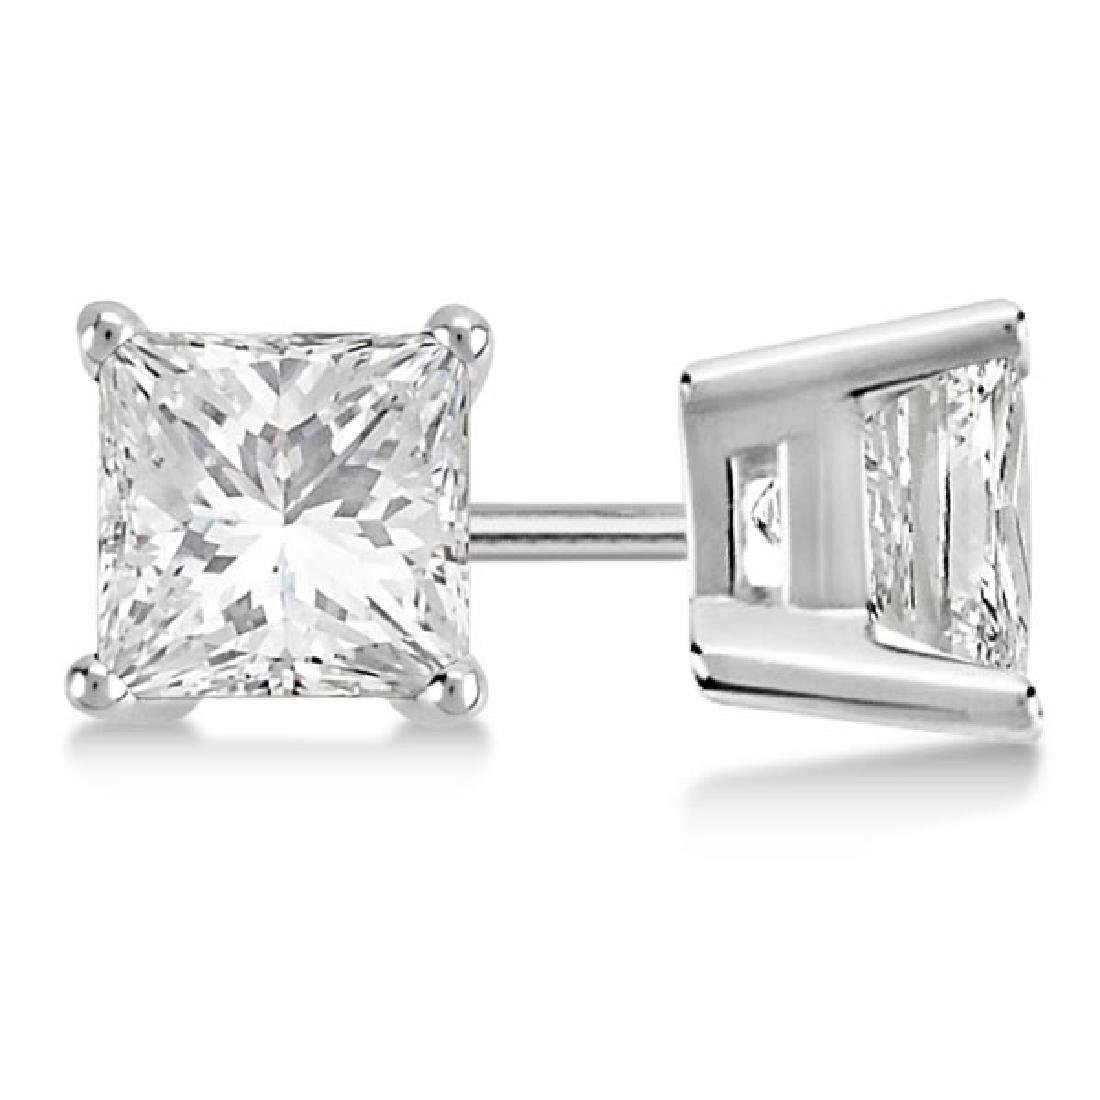 Certified 1.09 CTW Princess Diamond Stud Earrings H/SI1